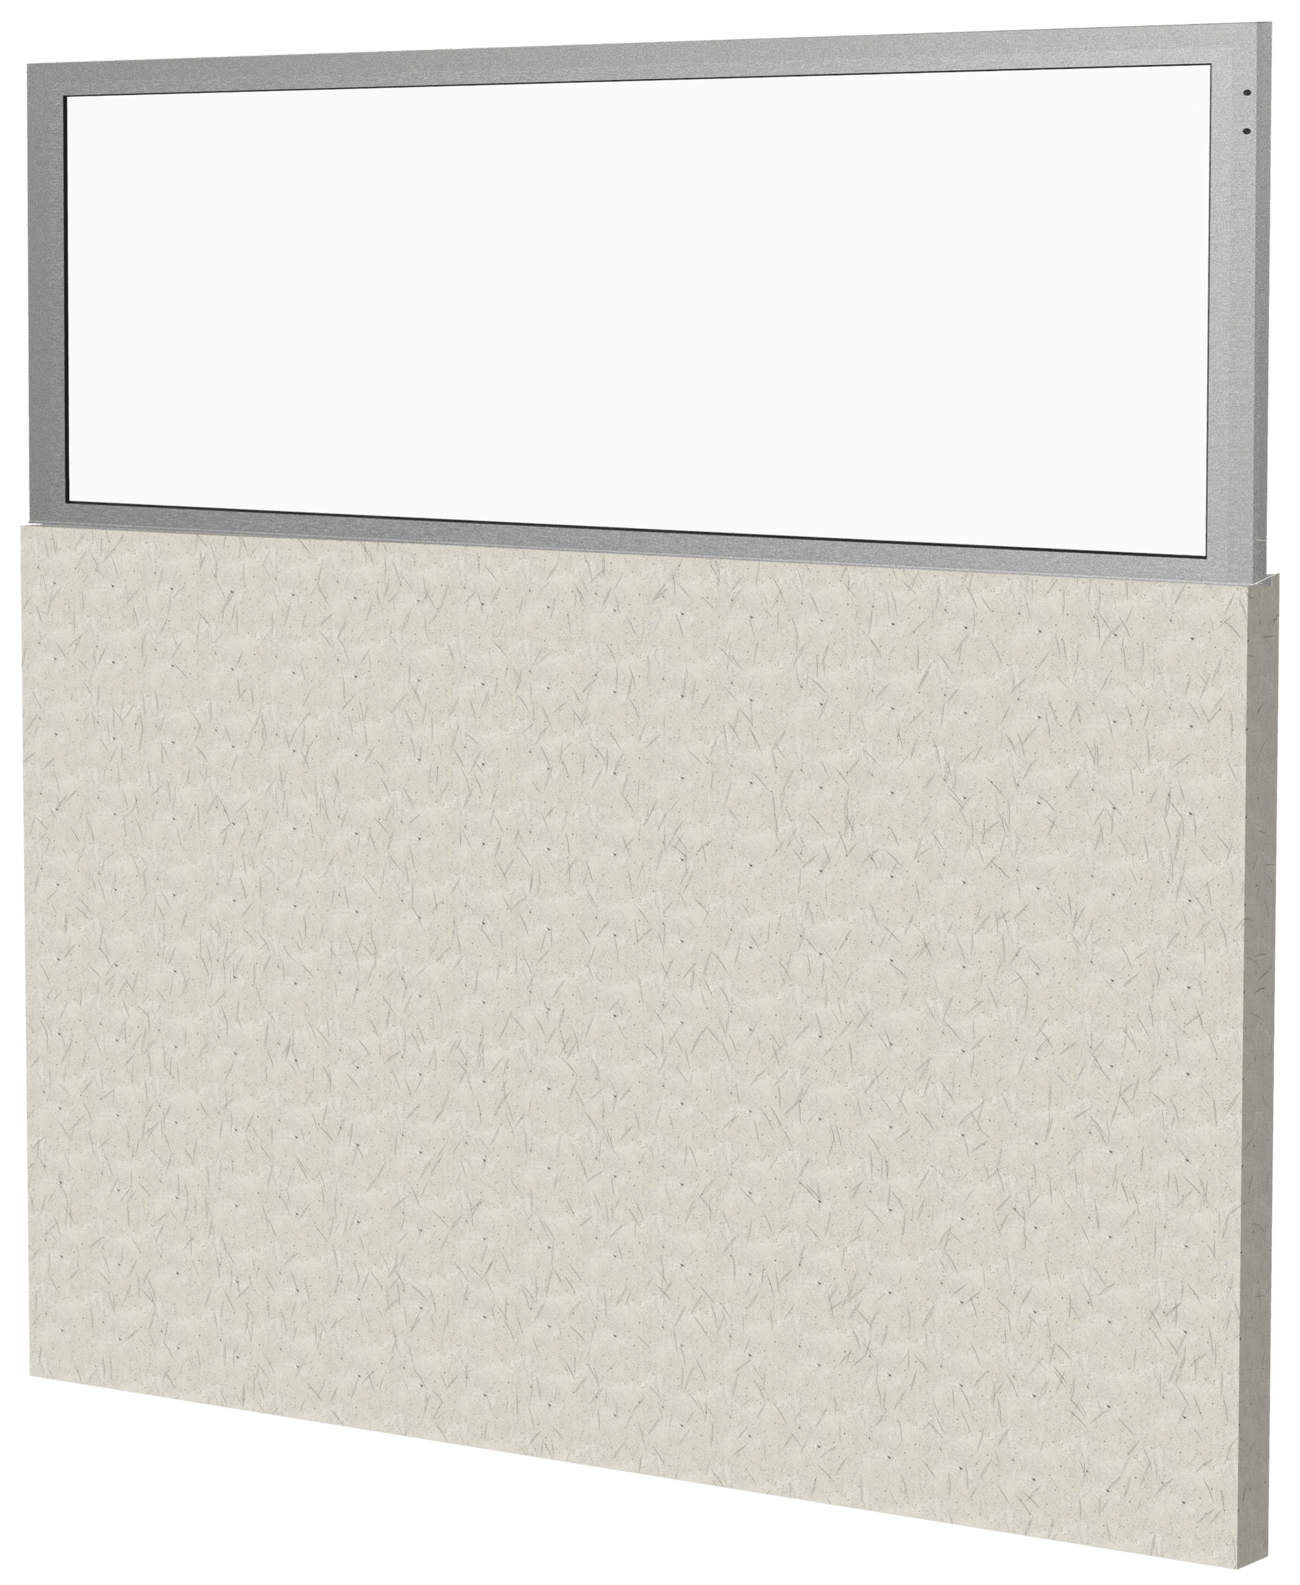 "24"" Glass Flag Panel for Cement Masonry Unit (CMU)"